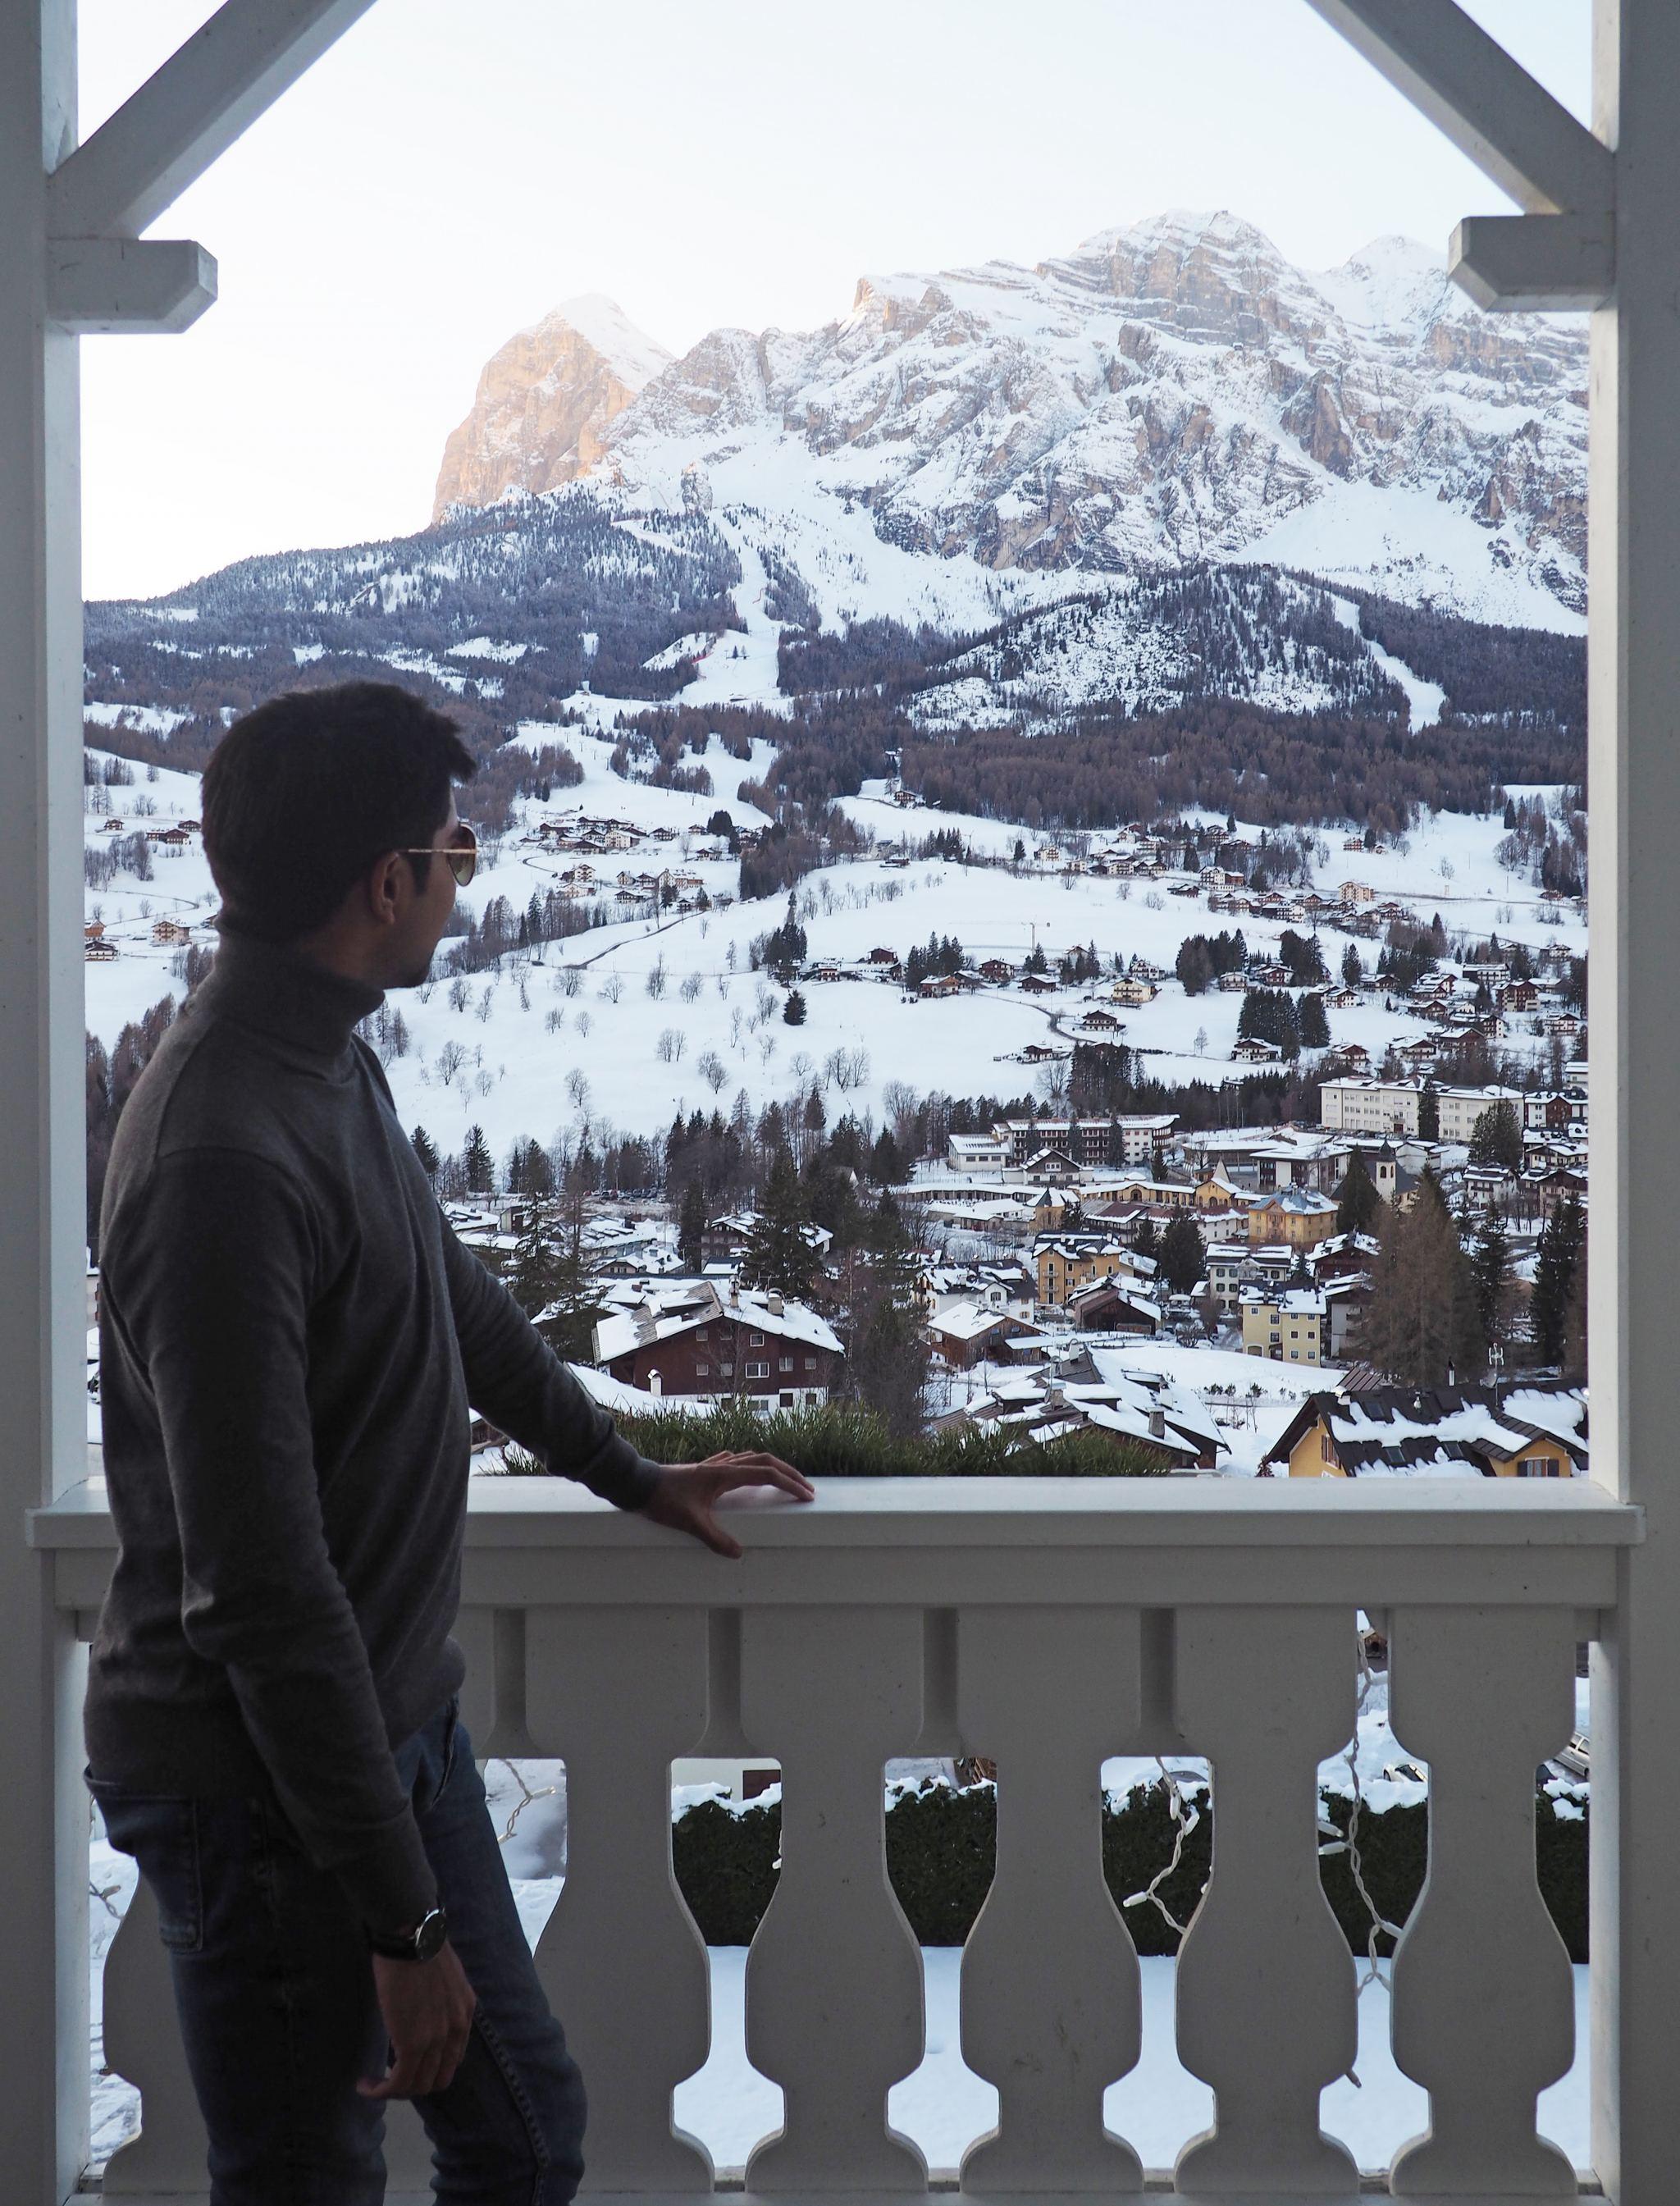 Luxury Travel: Cristallo Hotel, Cortina